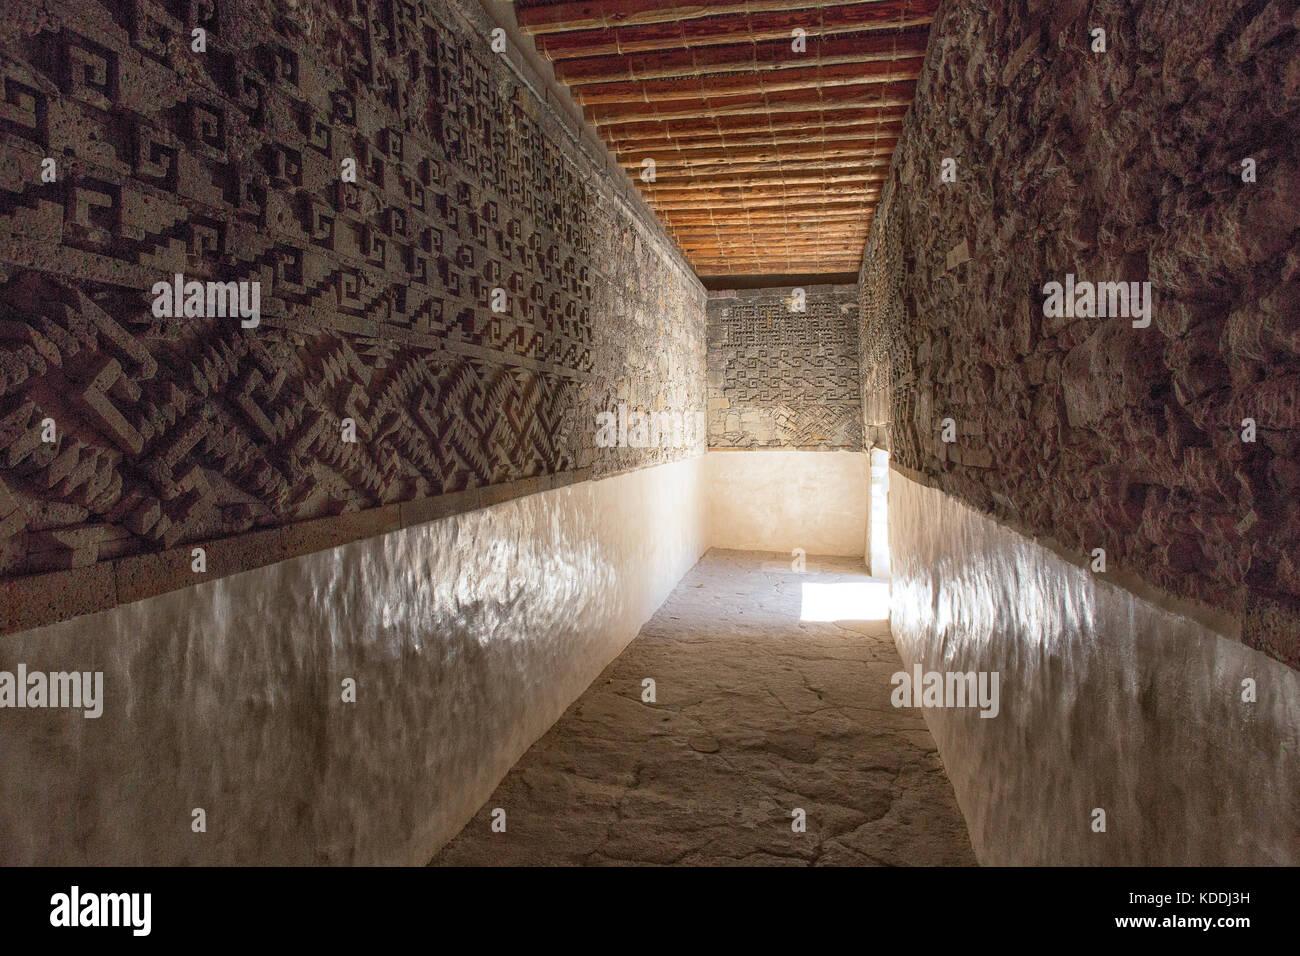 mosaic fretwork at Mitla ruins Oaxaca Mexico - Stock Image